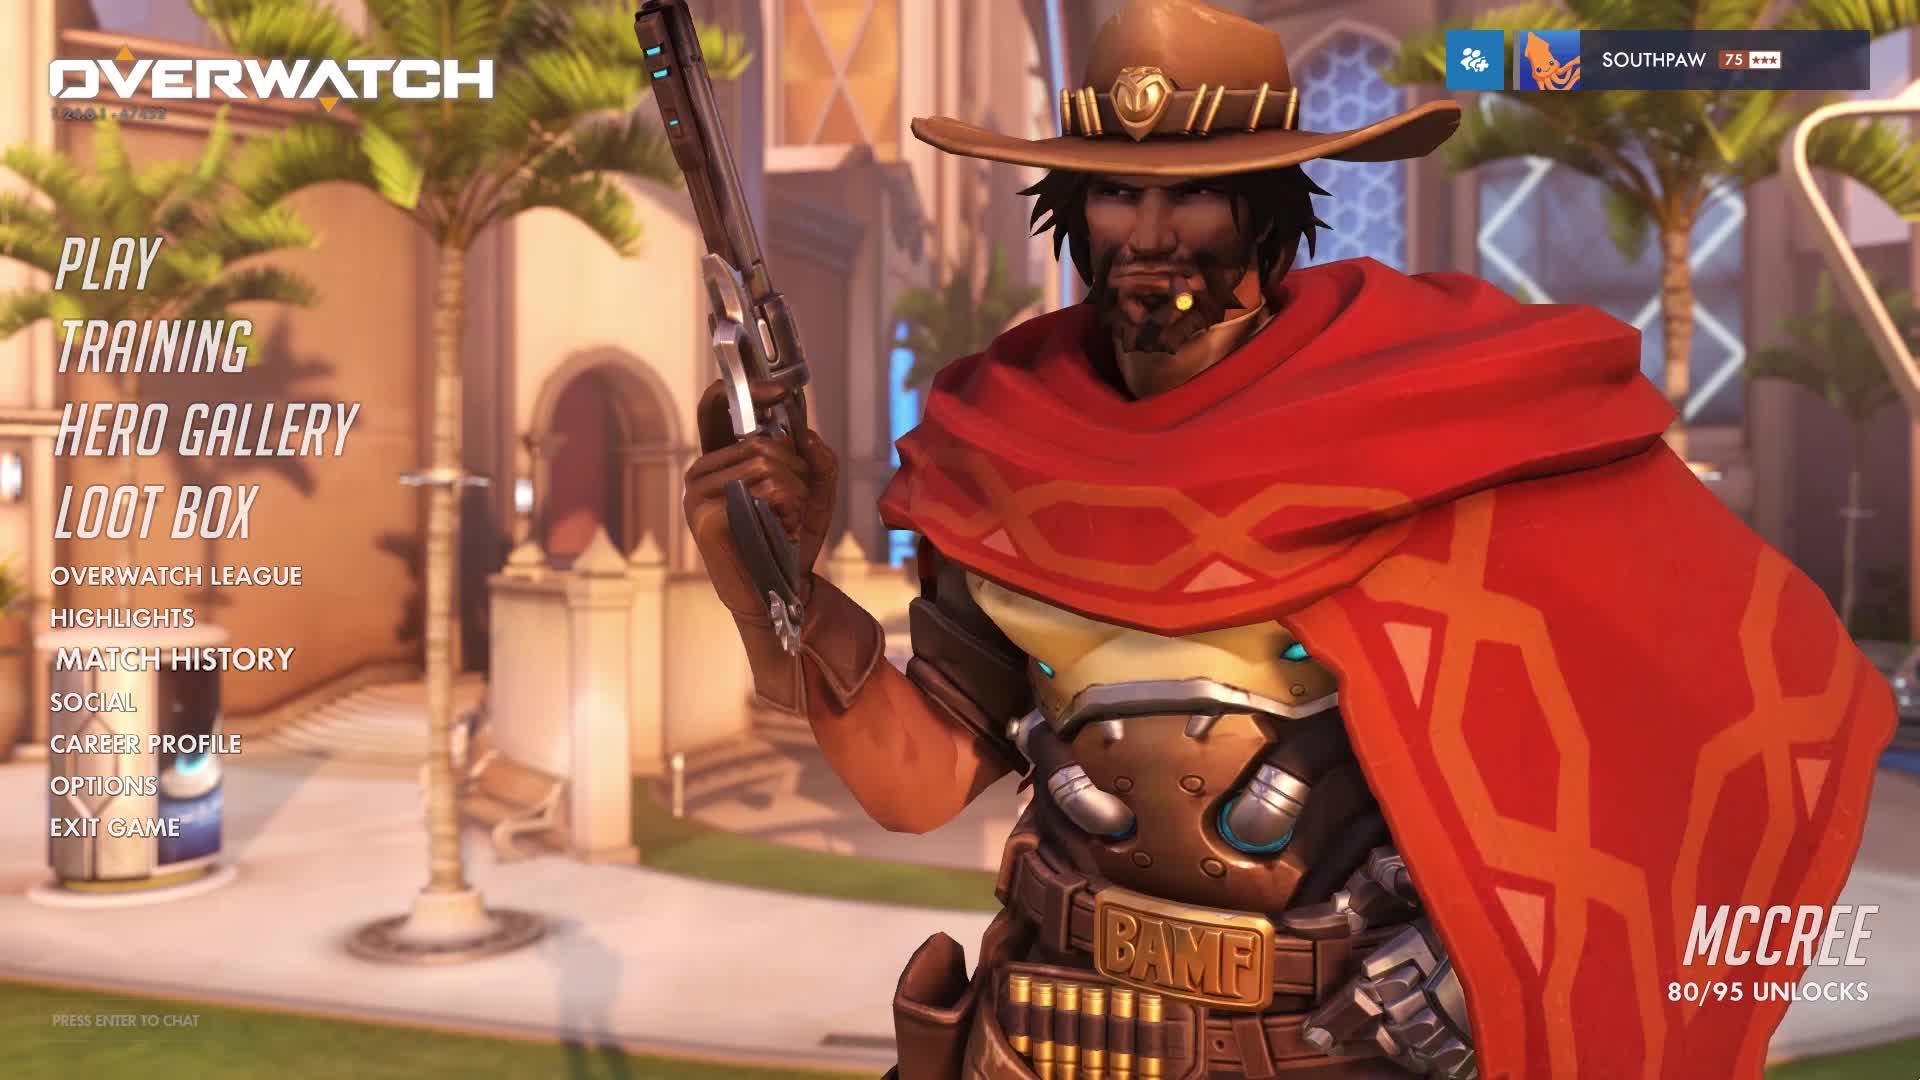 overwatch, replay system, Overwatch Replay System Concept GIFs